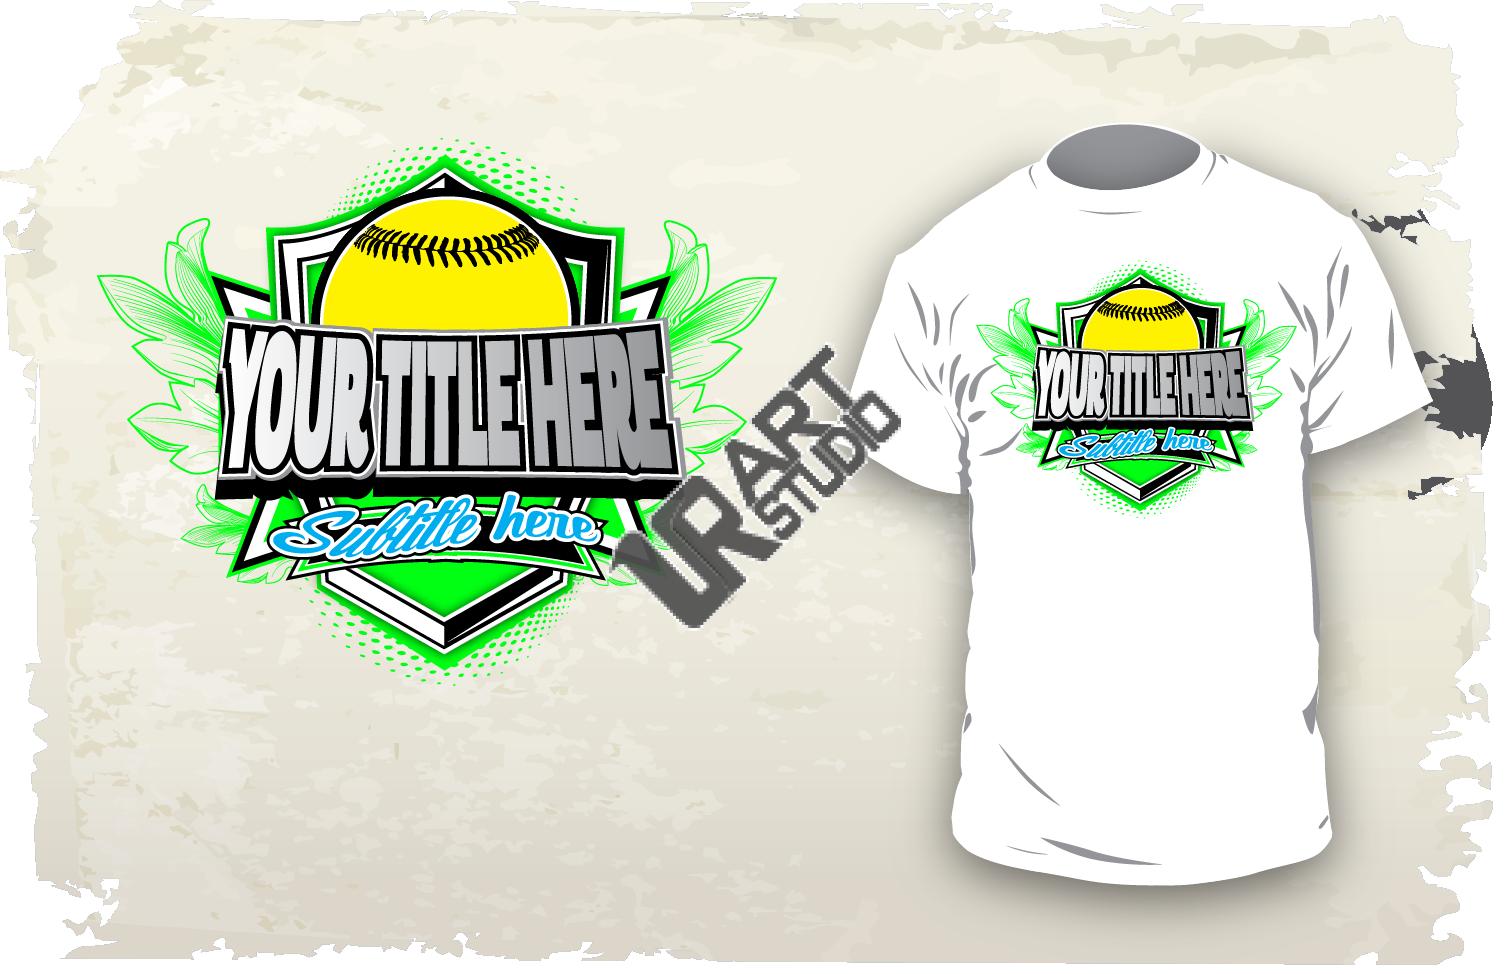 Download vector design for custom apparel your softball event